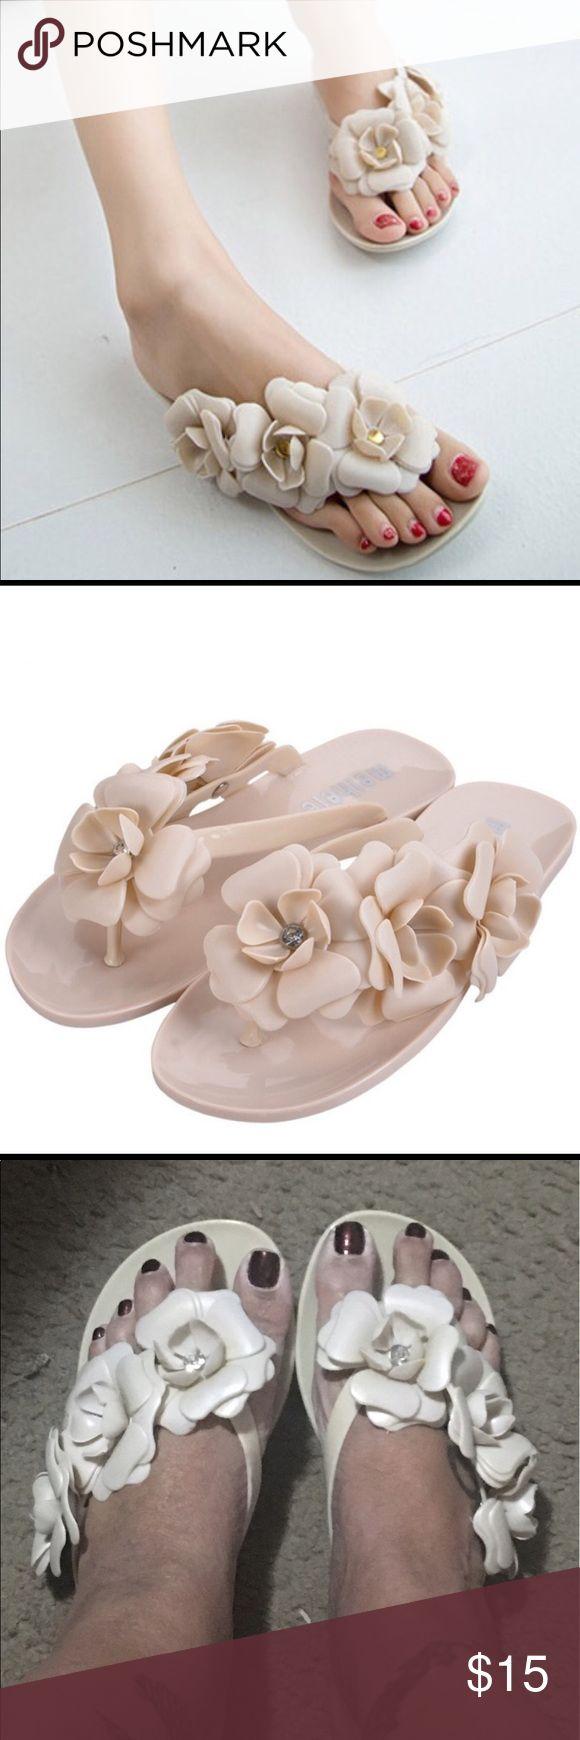 NWOT BEAUTIFUL CAMELIA FLOWER JELLY FLIP FLOPS Women's Jelly Flip Flops (slides). Flowers have Rhinestones inside each one, making them look very elegant 💎🌸 Shoes Slippers